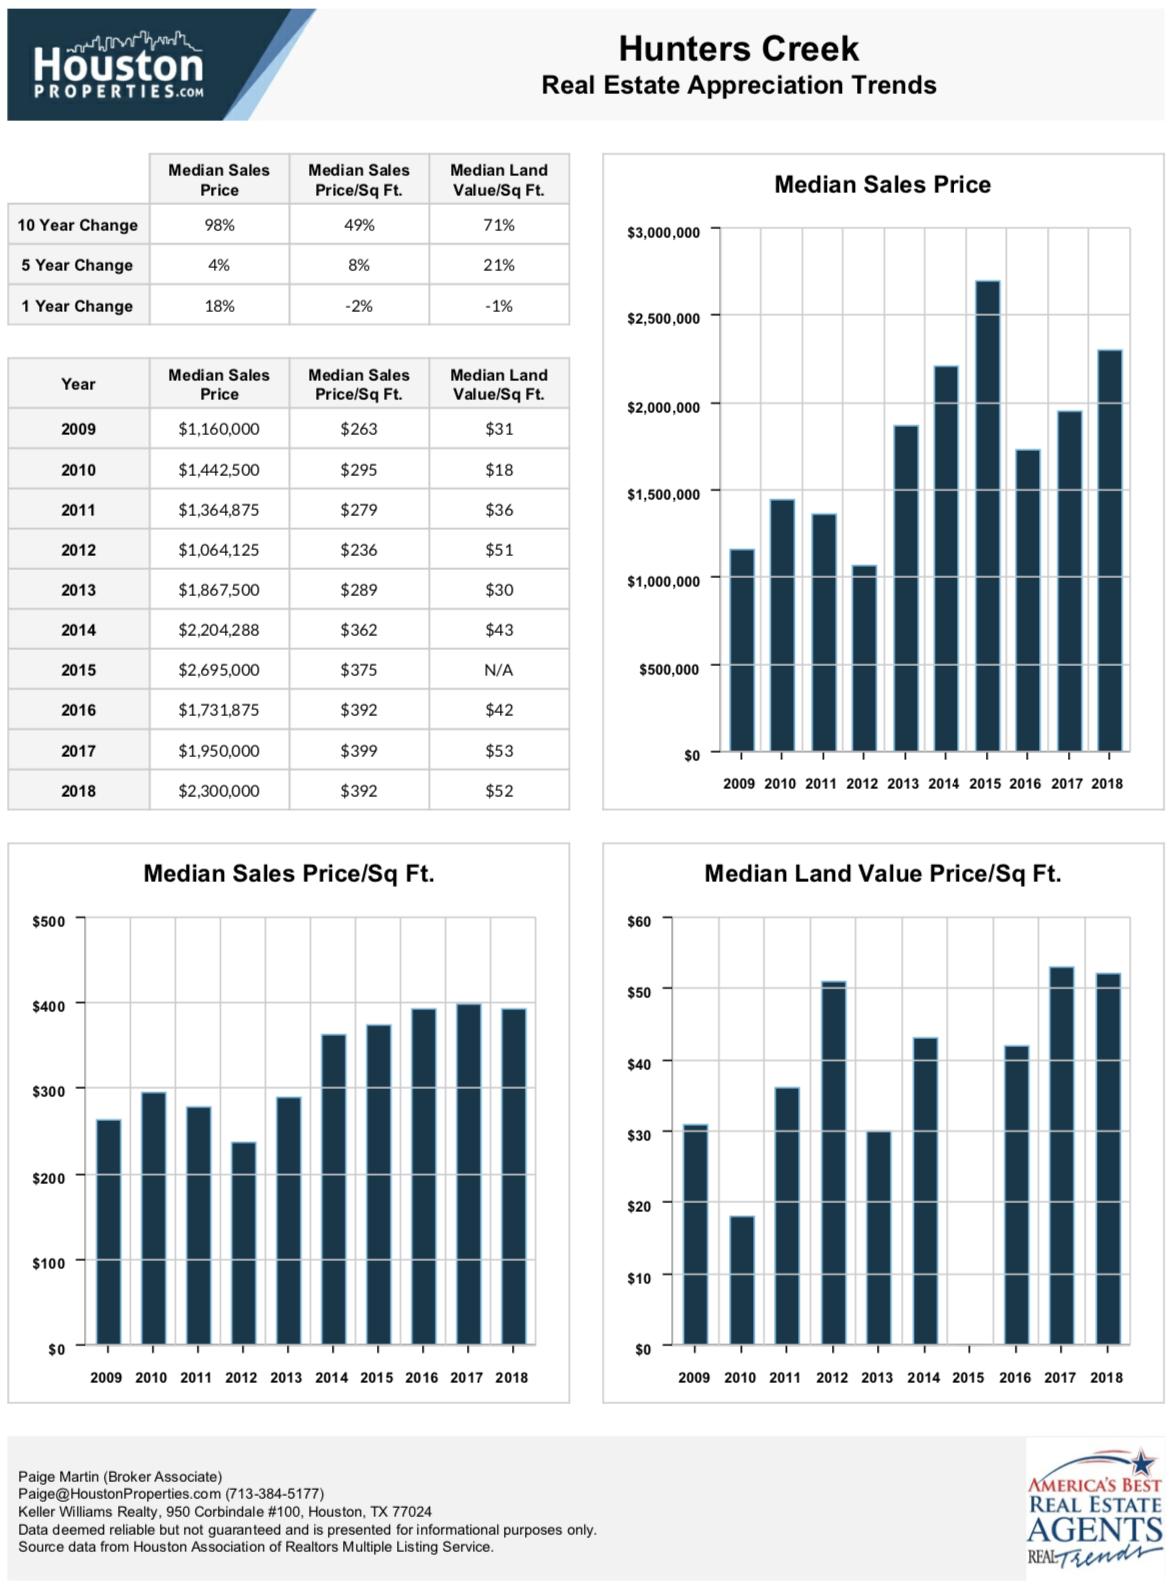 Hunters Creek real estate trends